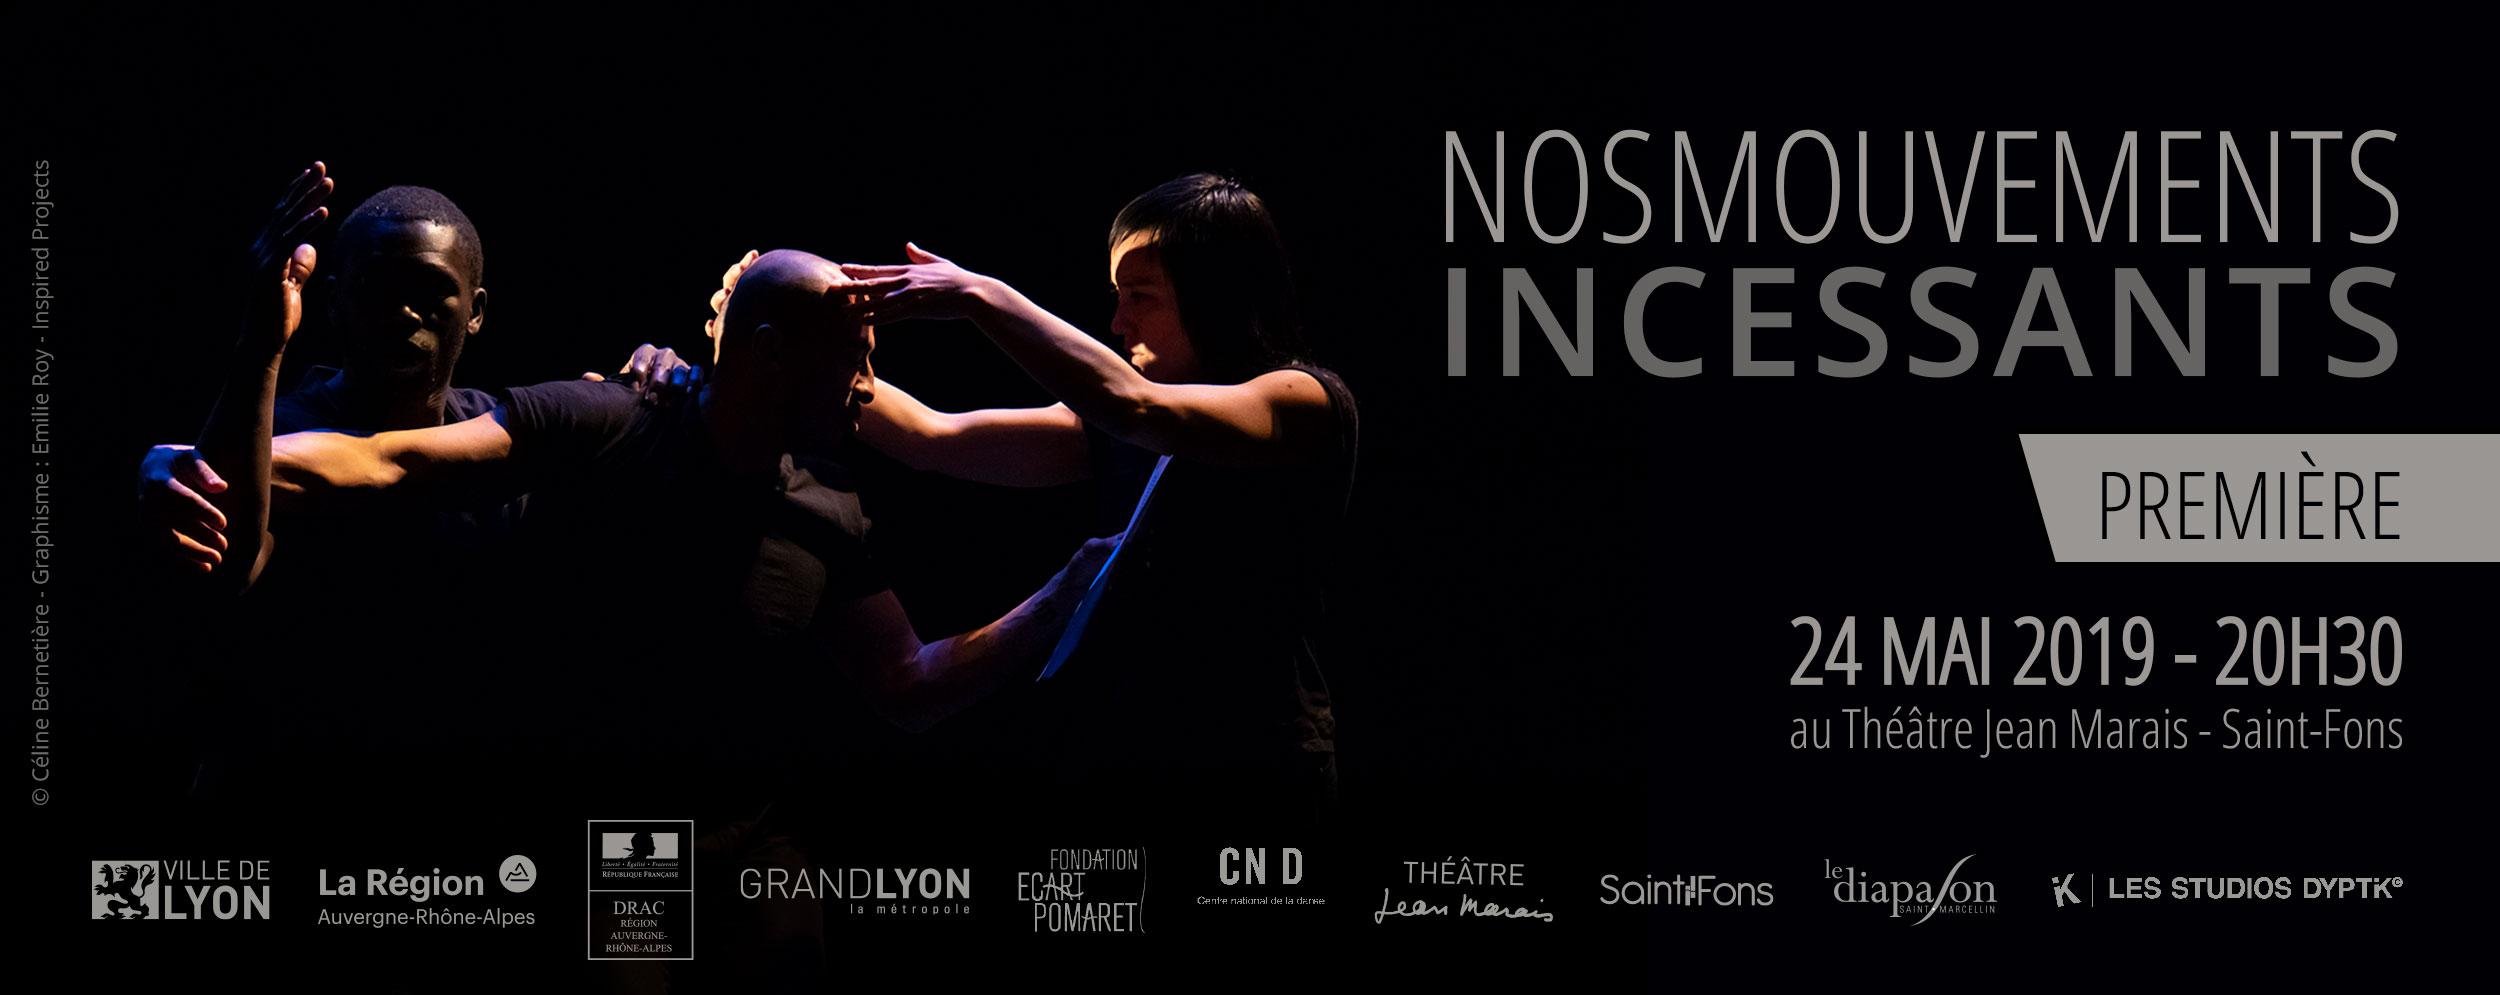 Bandeau_Cie-Stylistik_Premiere_NMI-24-mai-2019-Saint-Fons.jpg